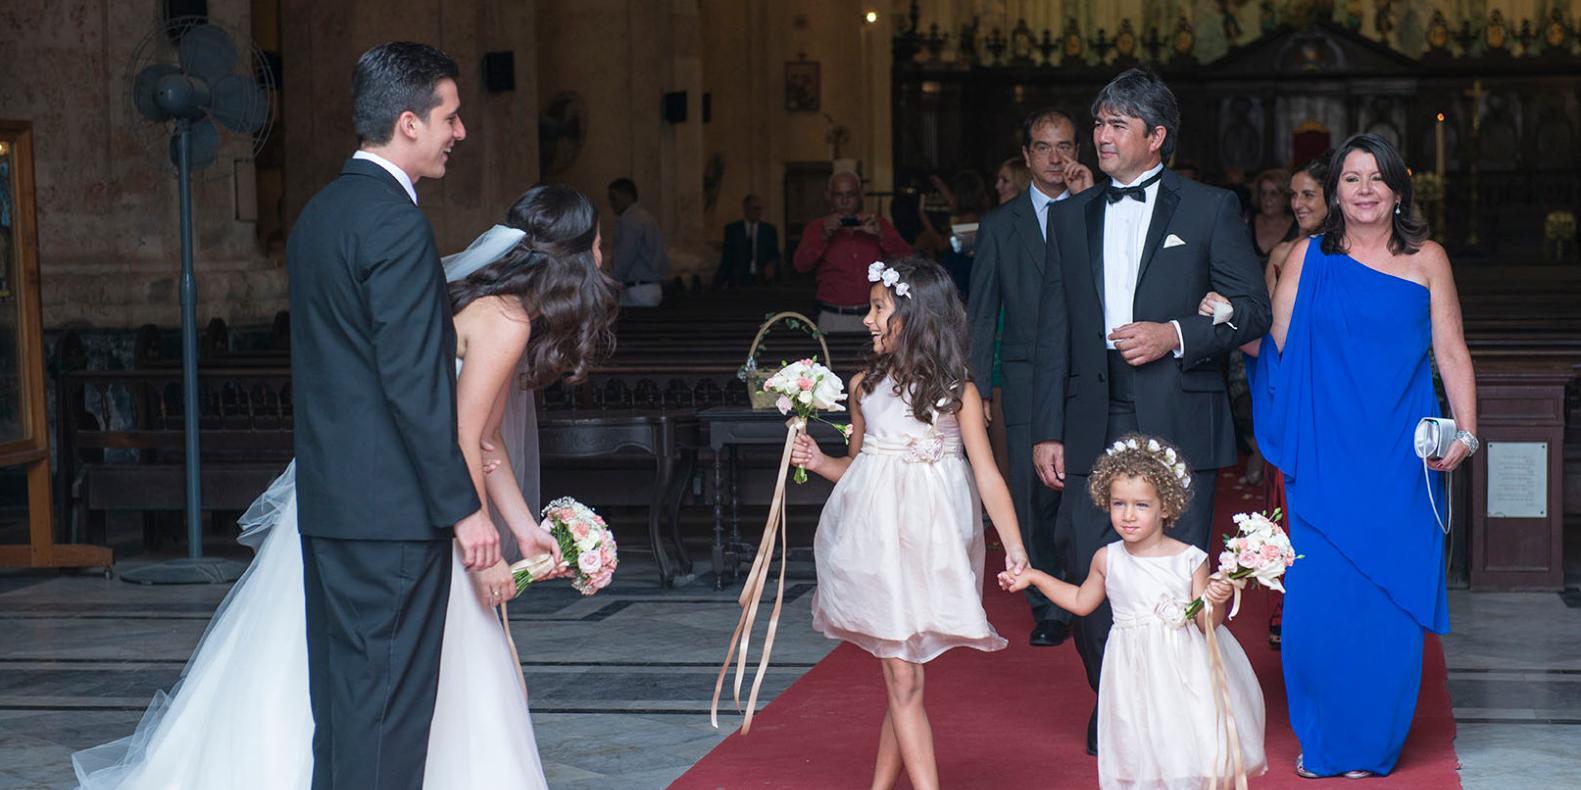 bodas-sin-clasificar-sin-tema-cuba-15001.jpg